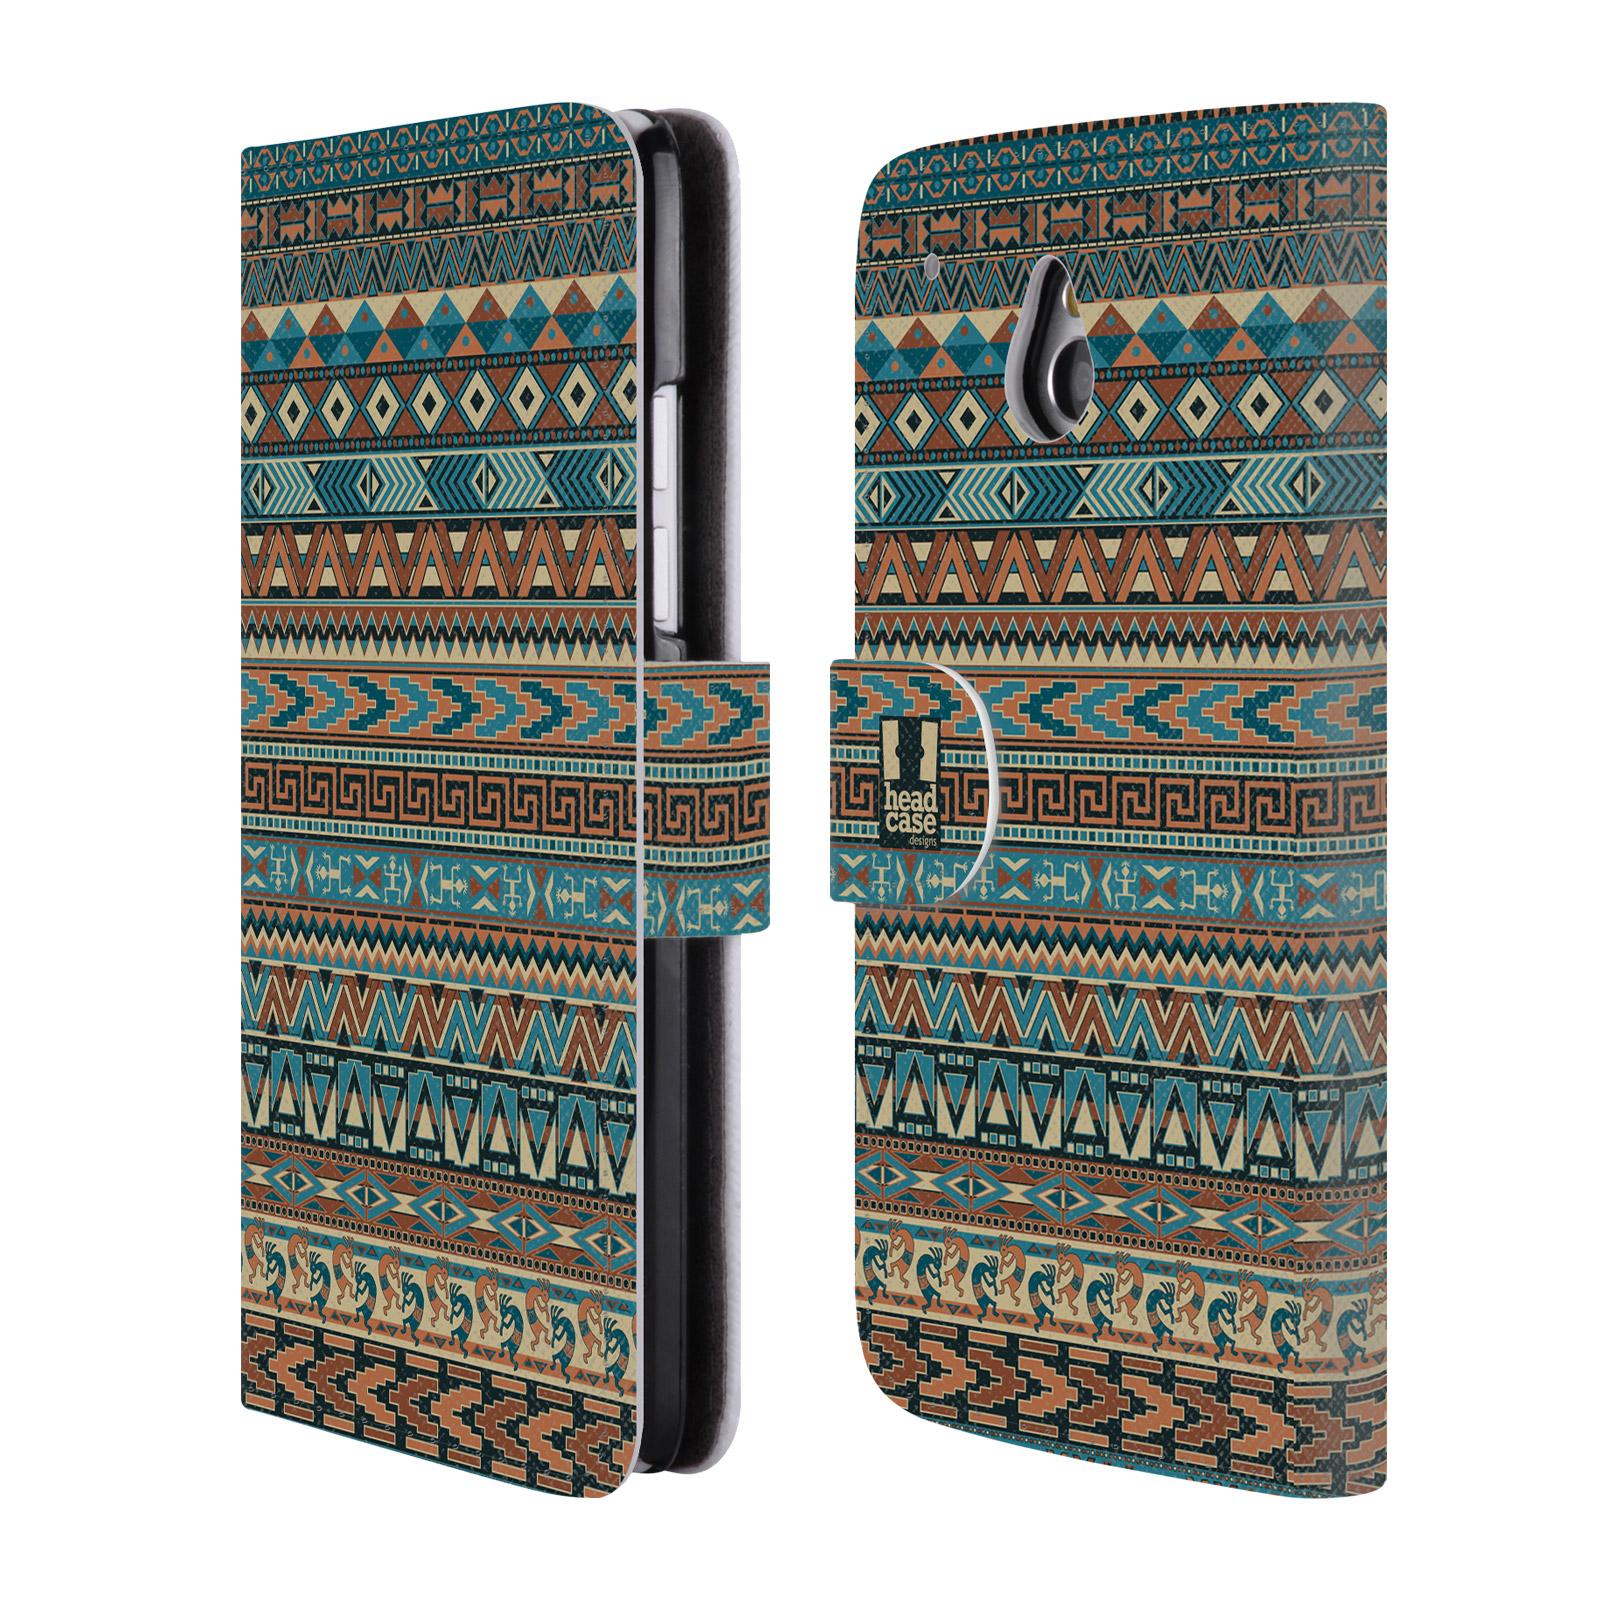 HEAD CASE Flipové pouzdro pro mobil HTC ONE MINI (M4) Indiánský vzor BLUE modrá